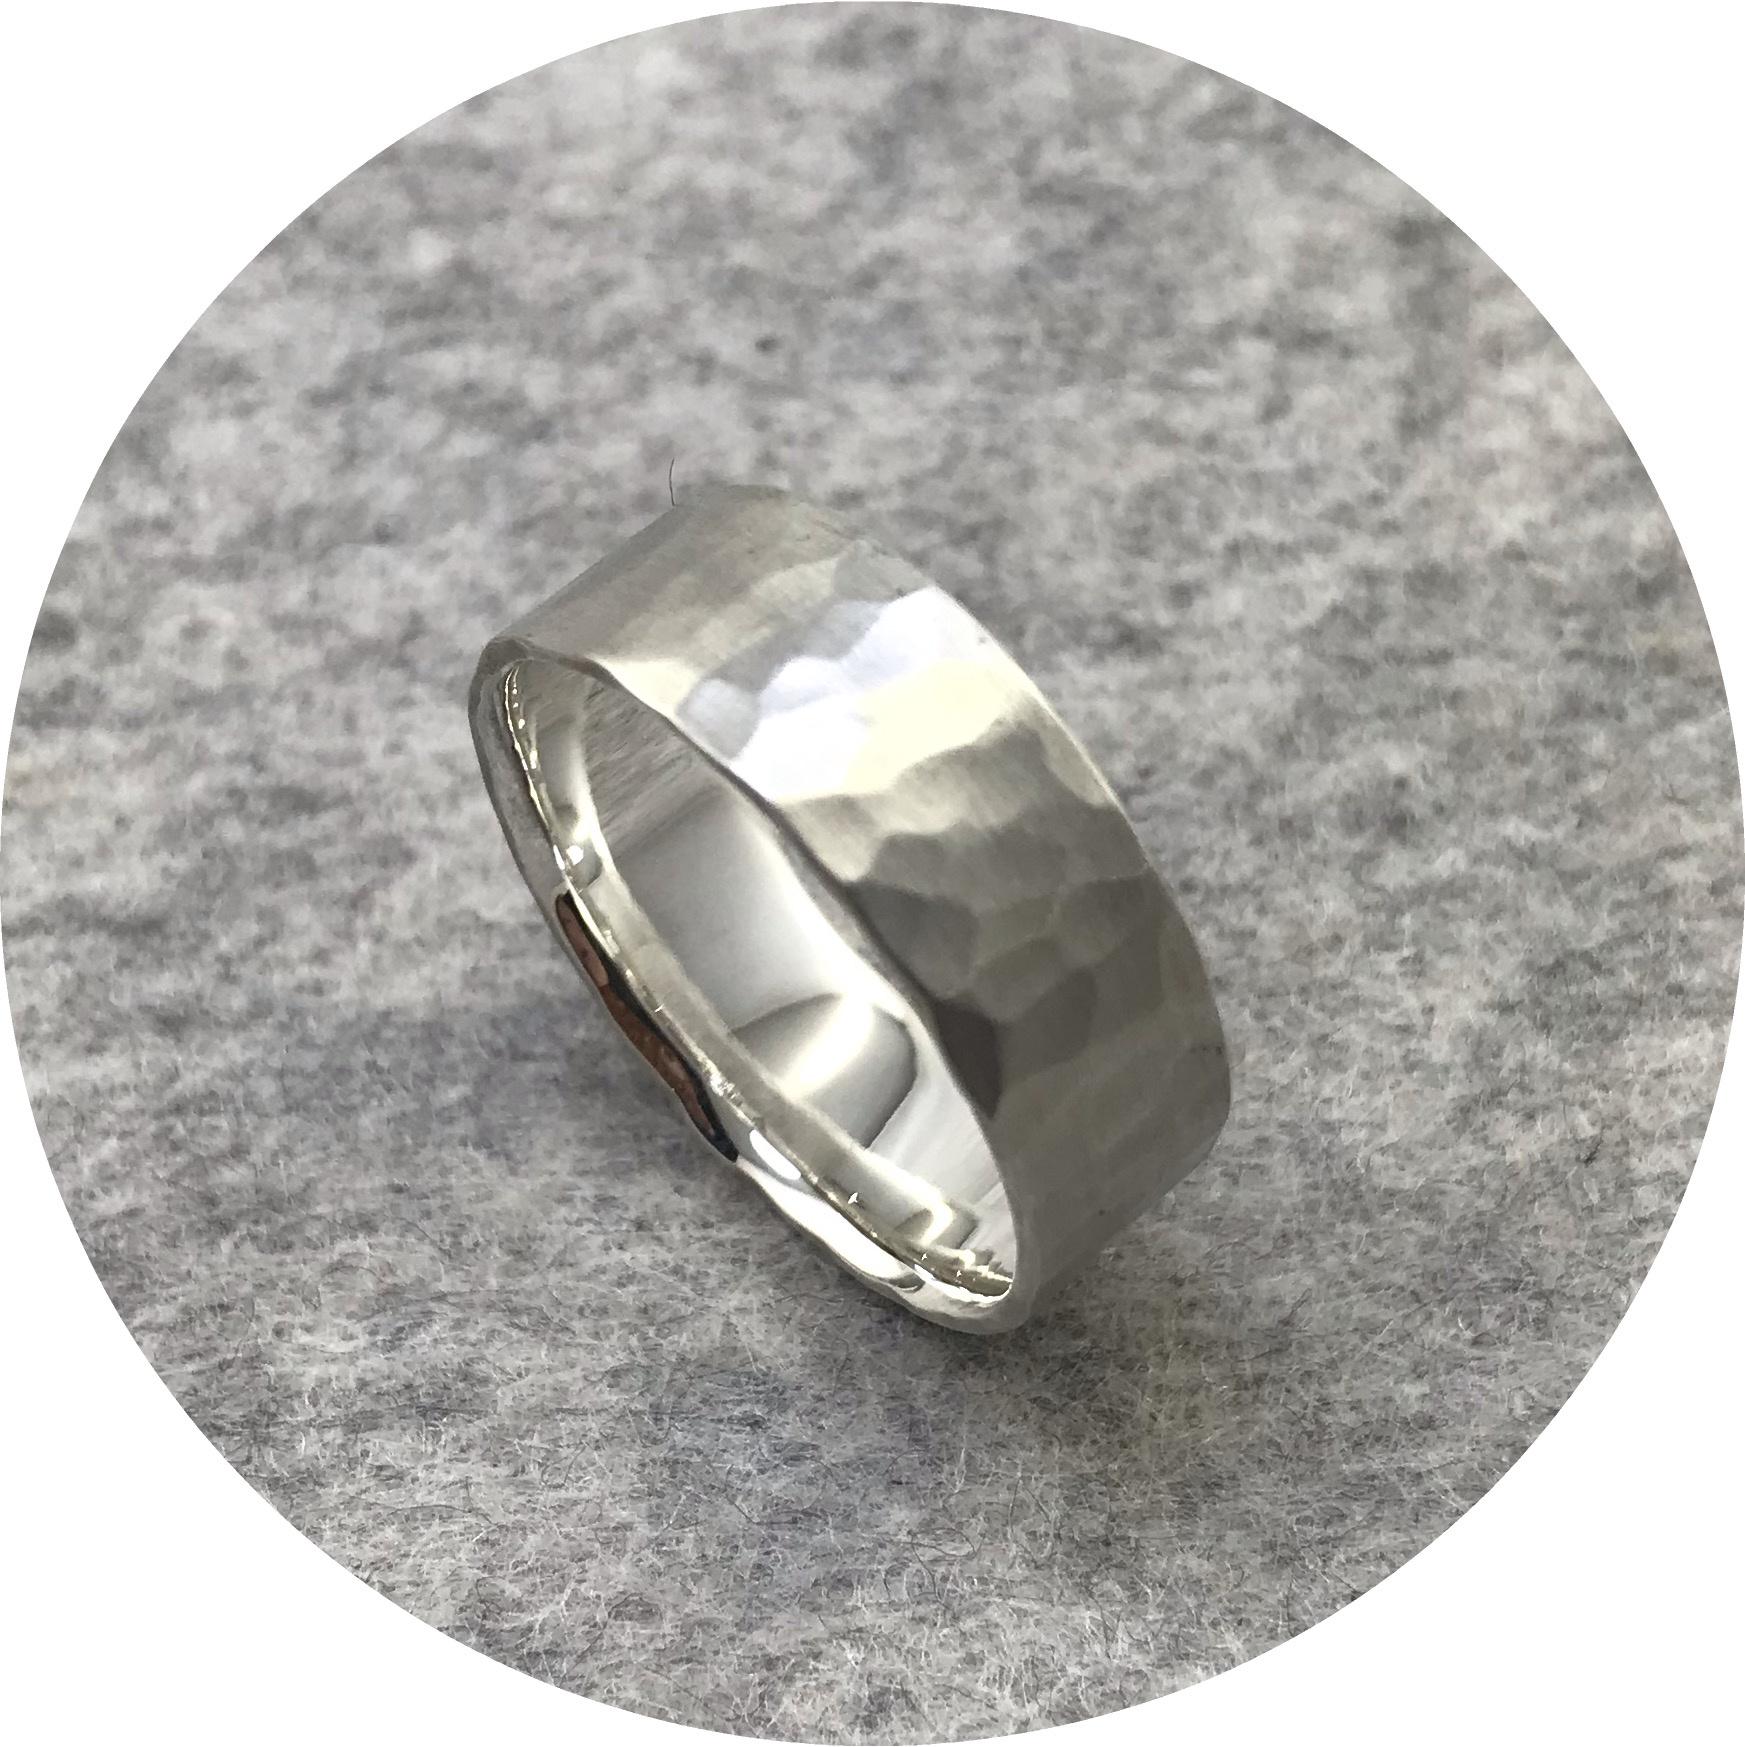 Emily Becher - 'Ripples Ring', 925 silver R 3/4